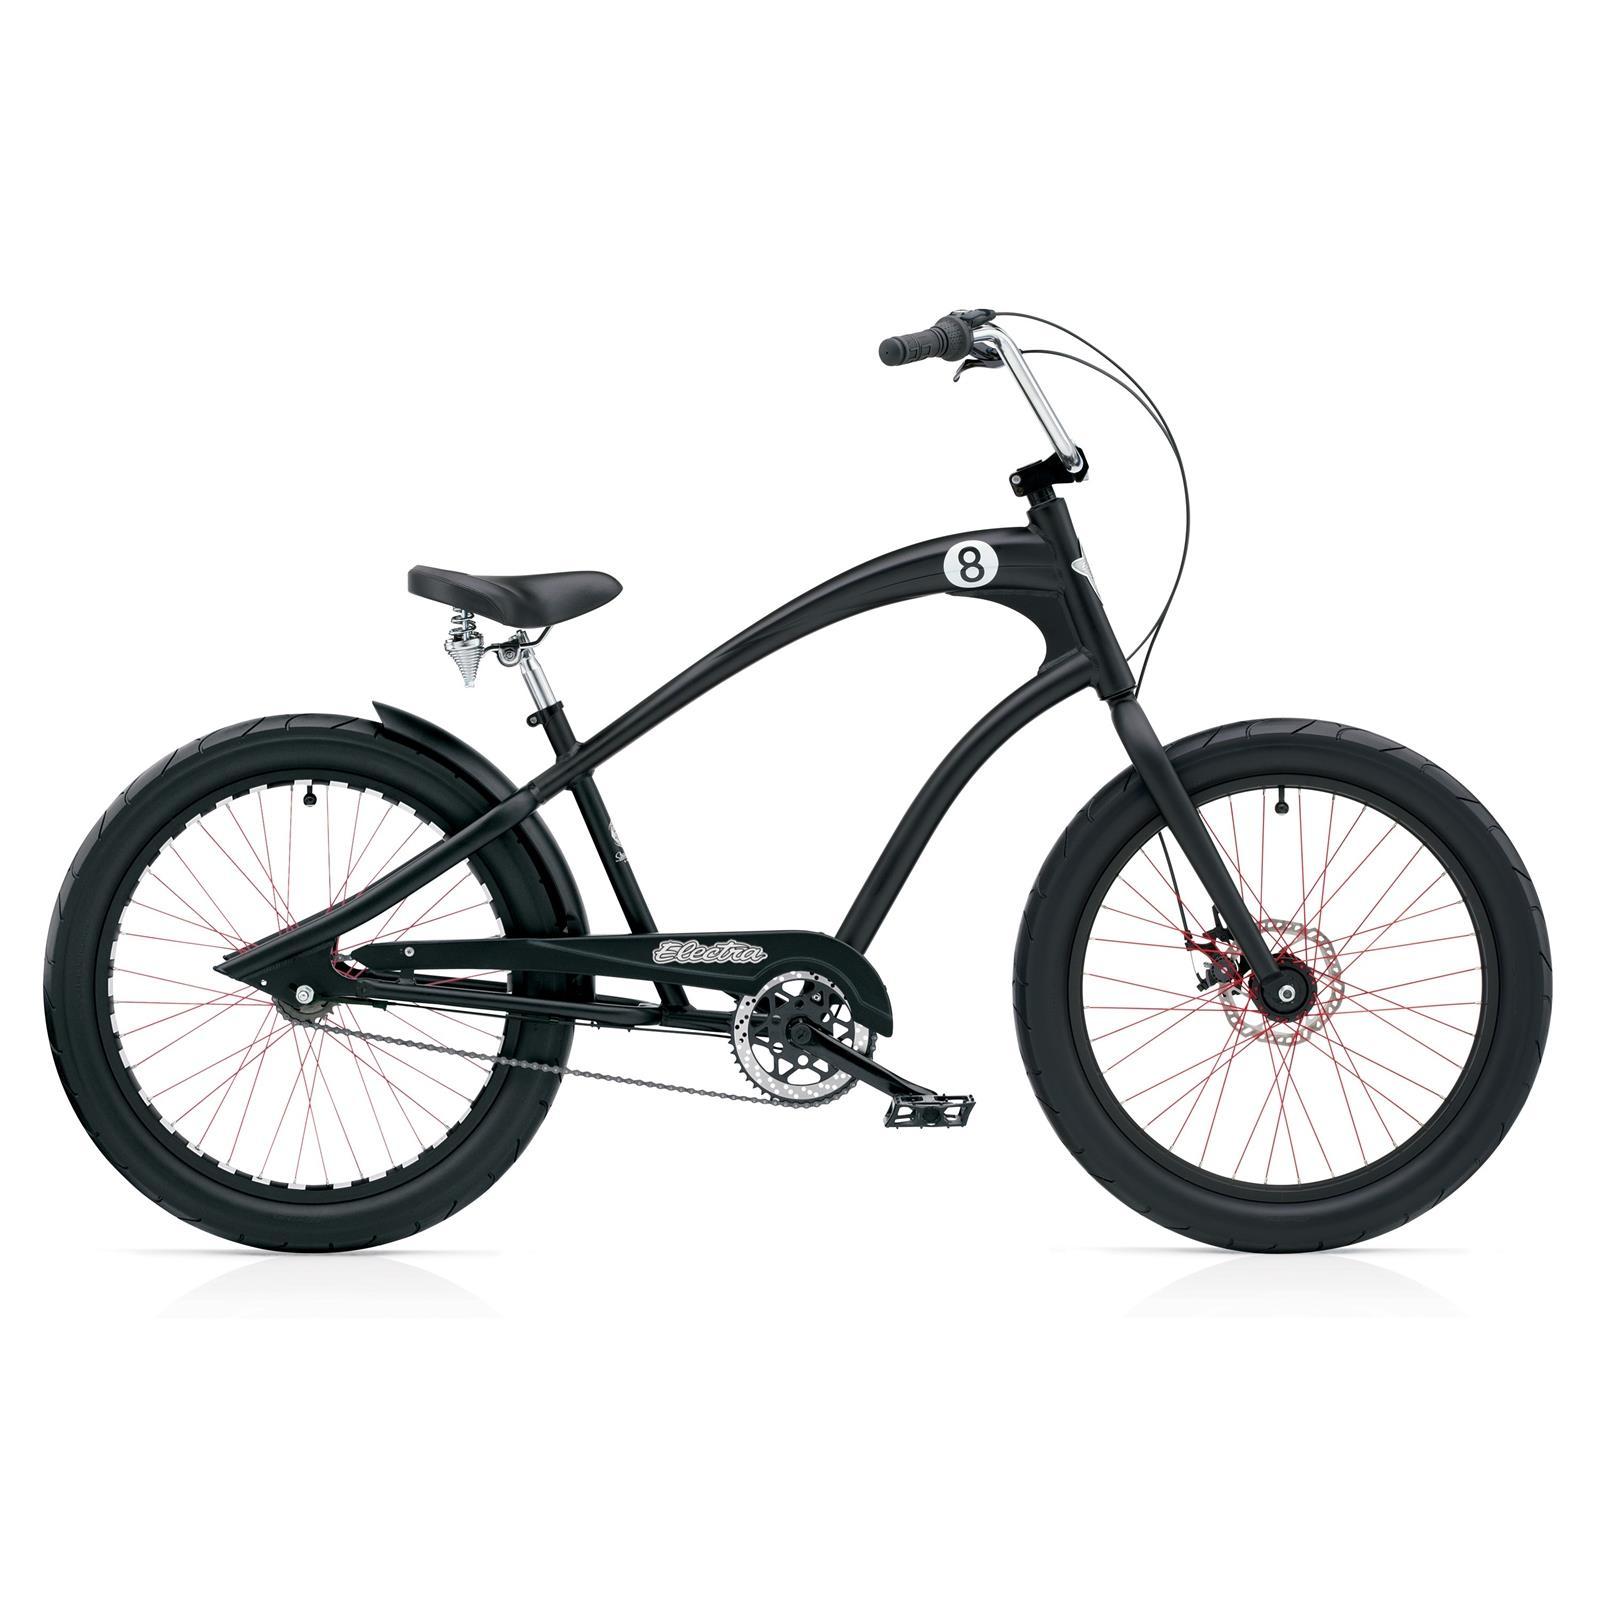 Electra-Straight-8-8i-Men-Black-Satin-DISC-Cruiser-Fahrrad-Modell-2014